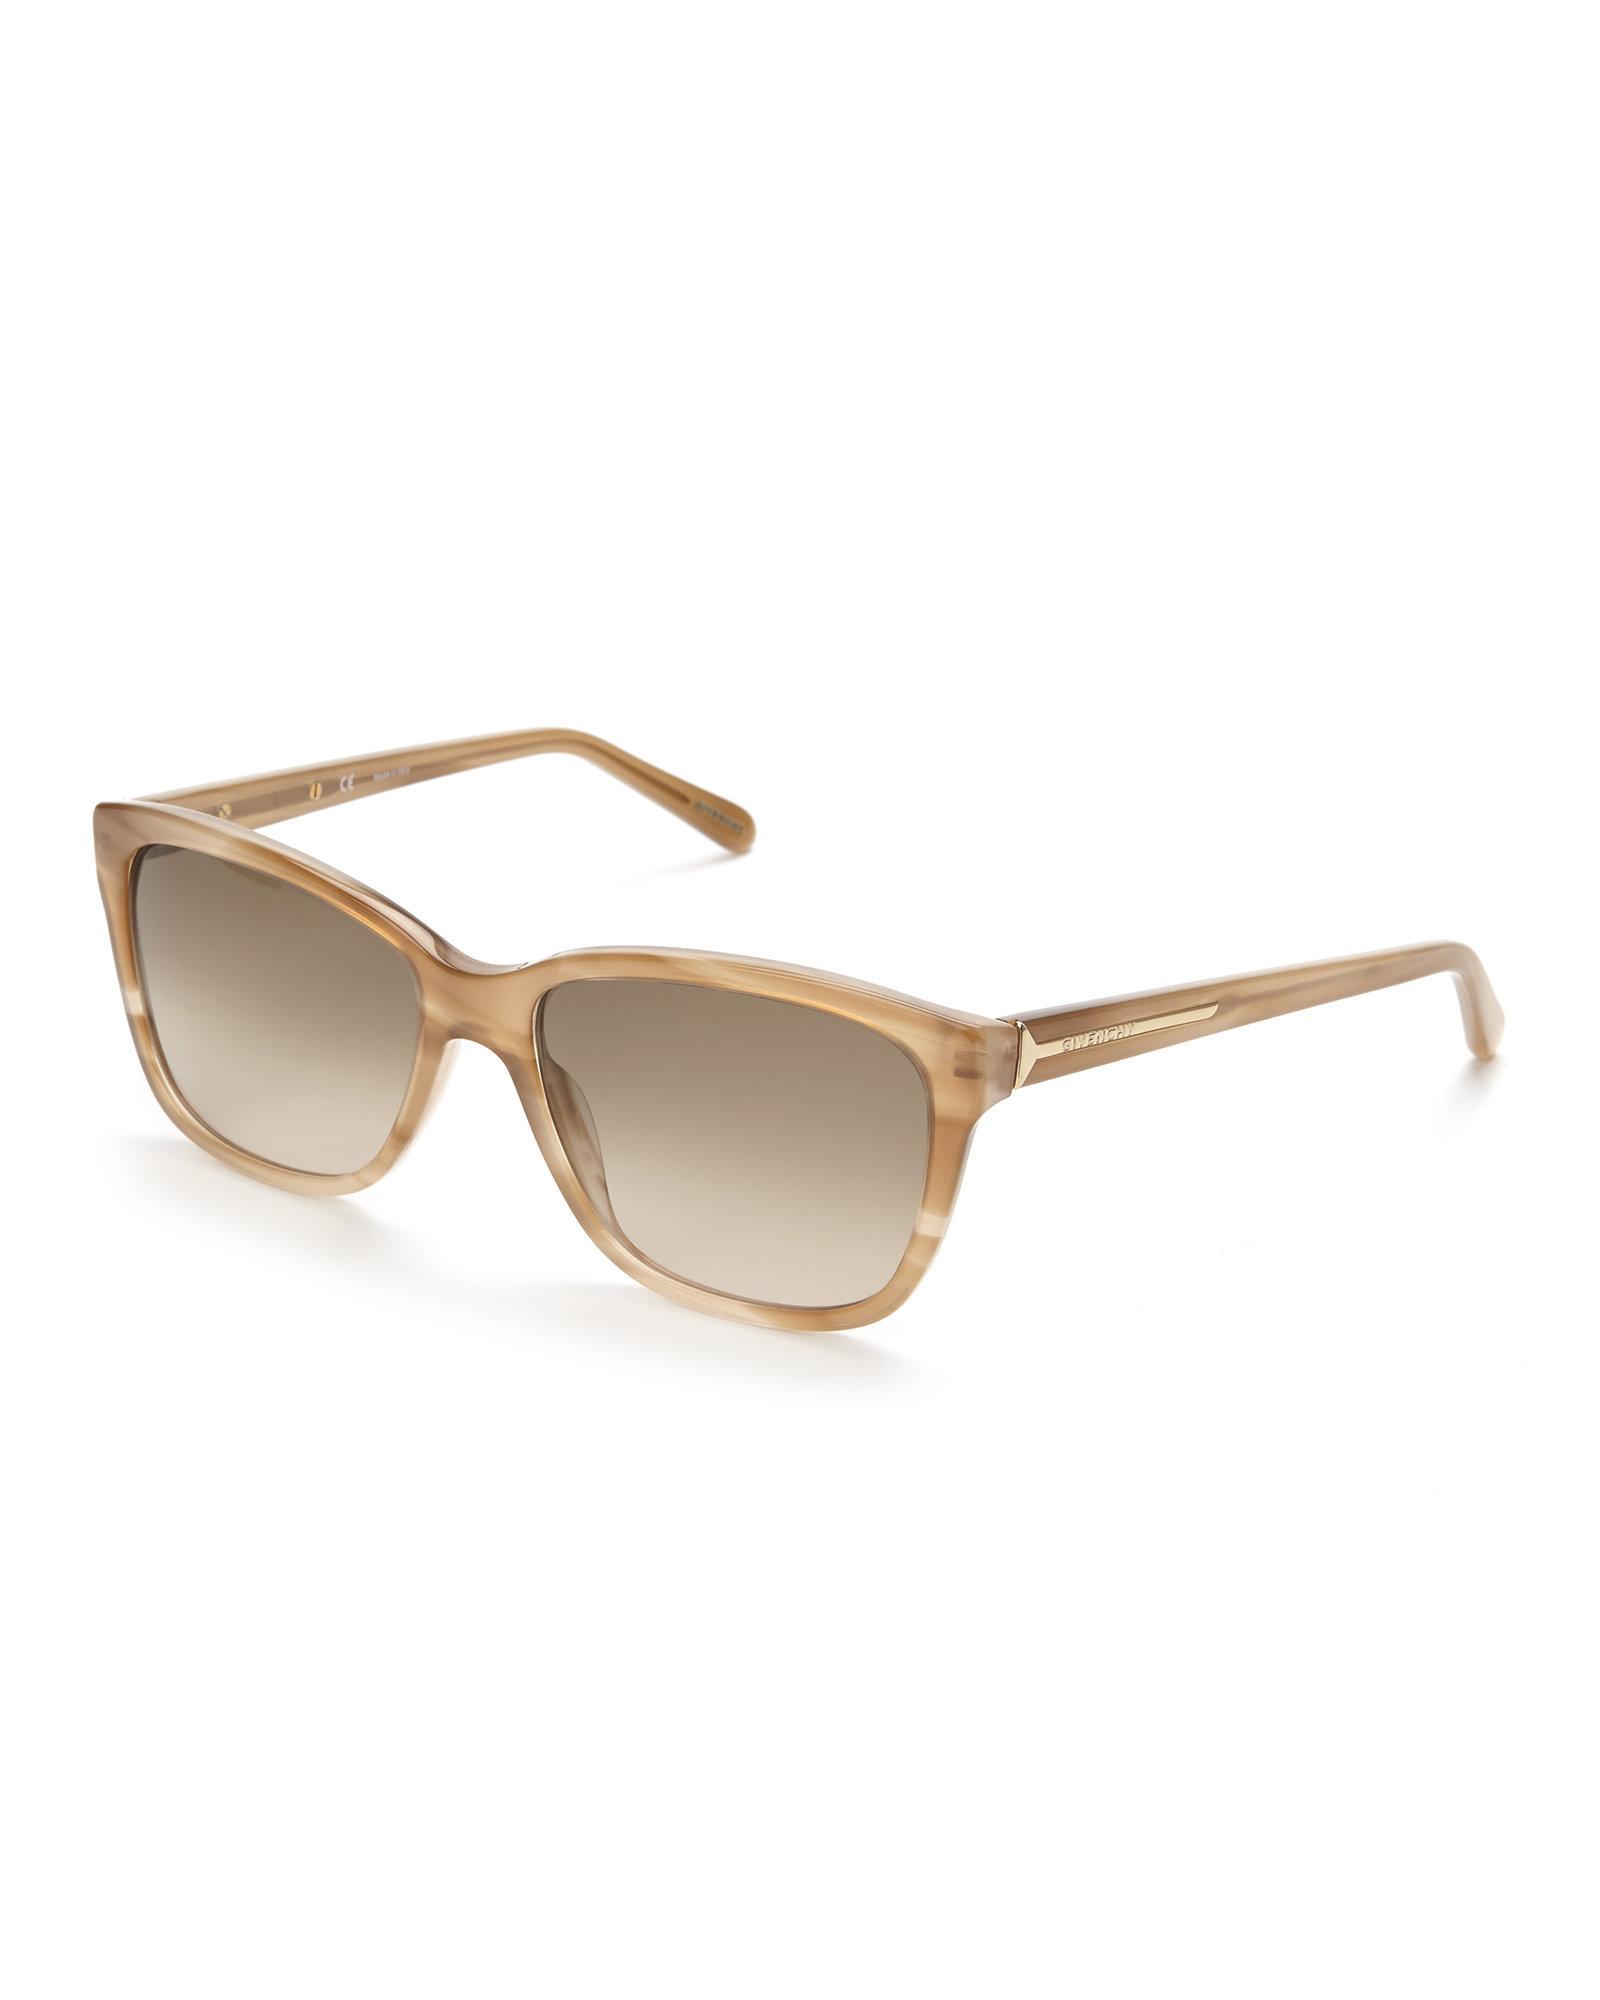 Metallic Gold Frame Wayfarer Sunglasses : Givenchy Gold Sgv 811 Wayfarer Sunglasses in Metallic Lyst